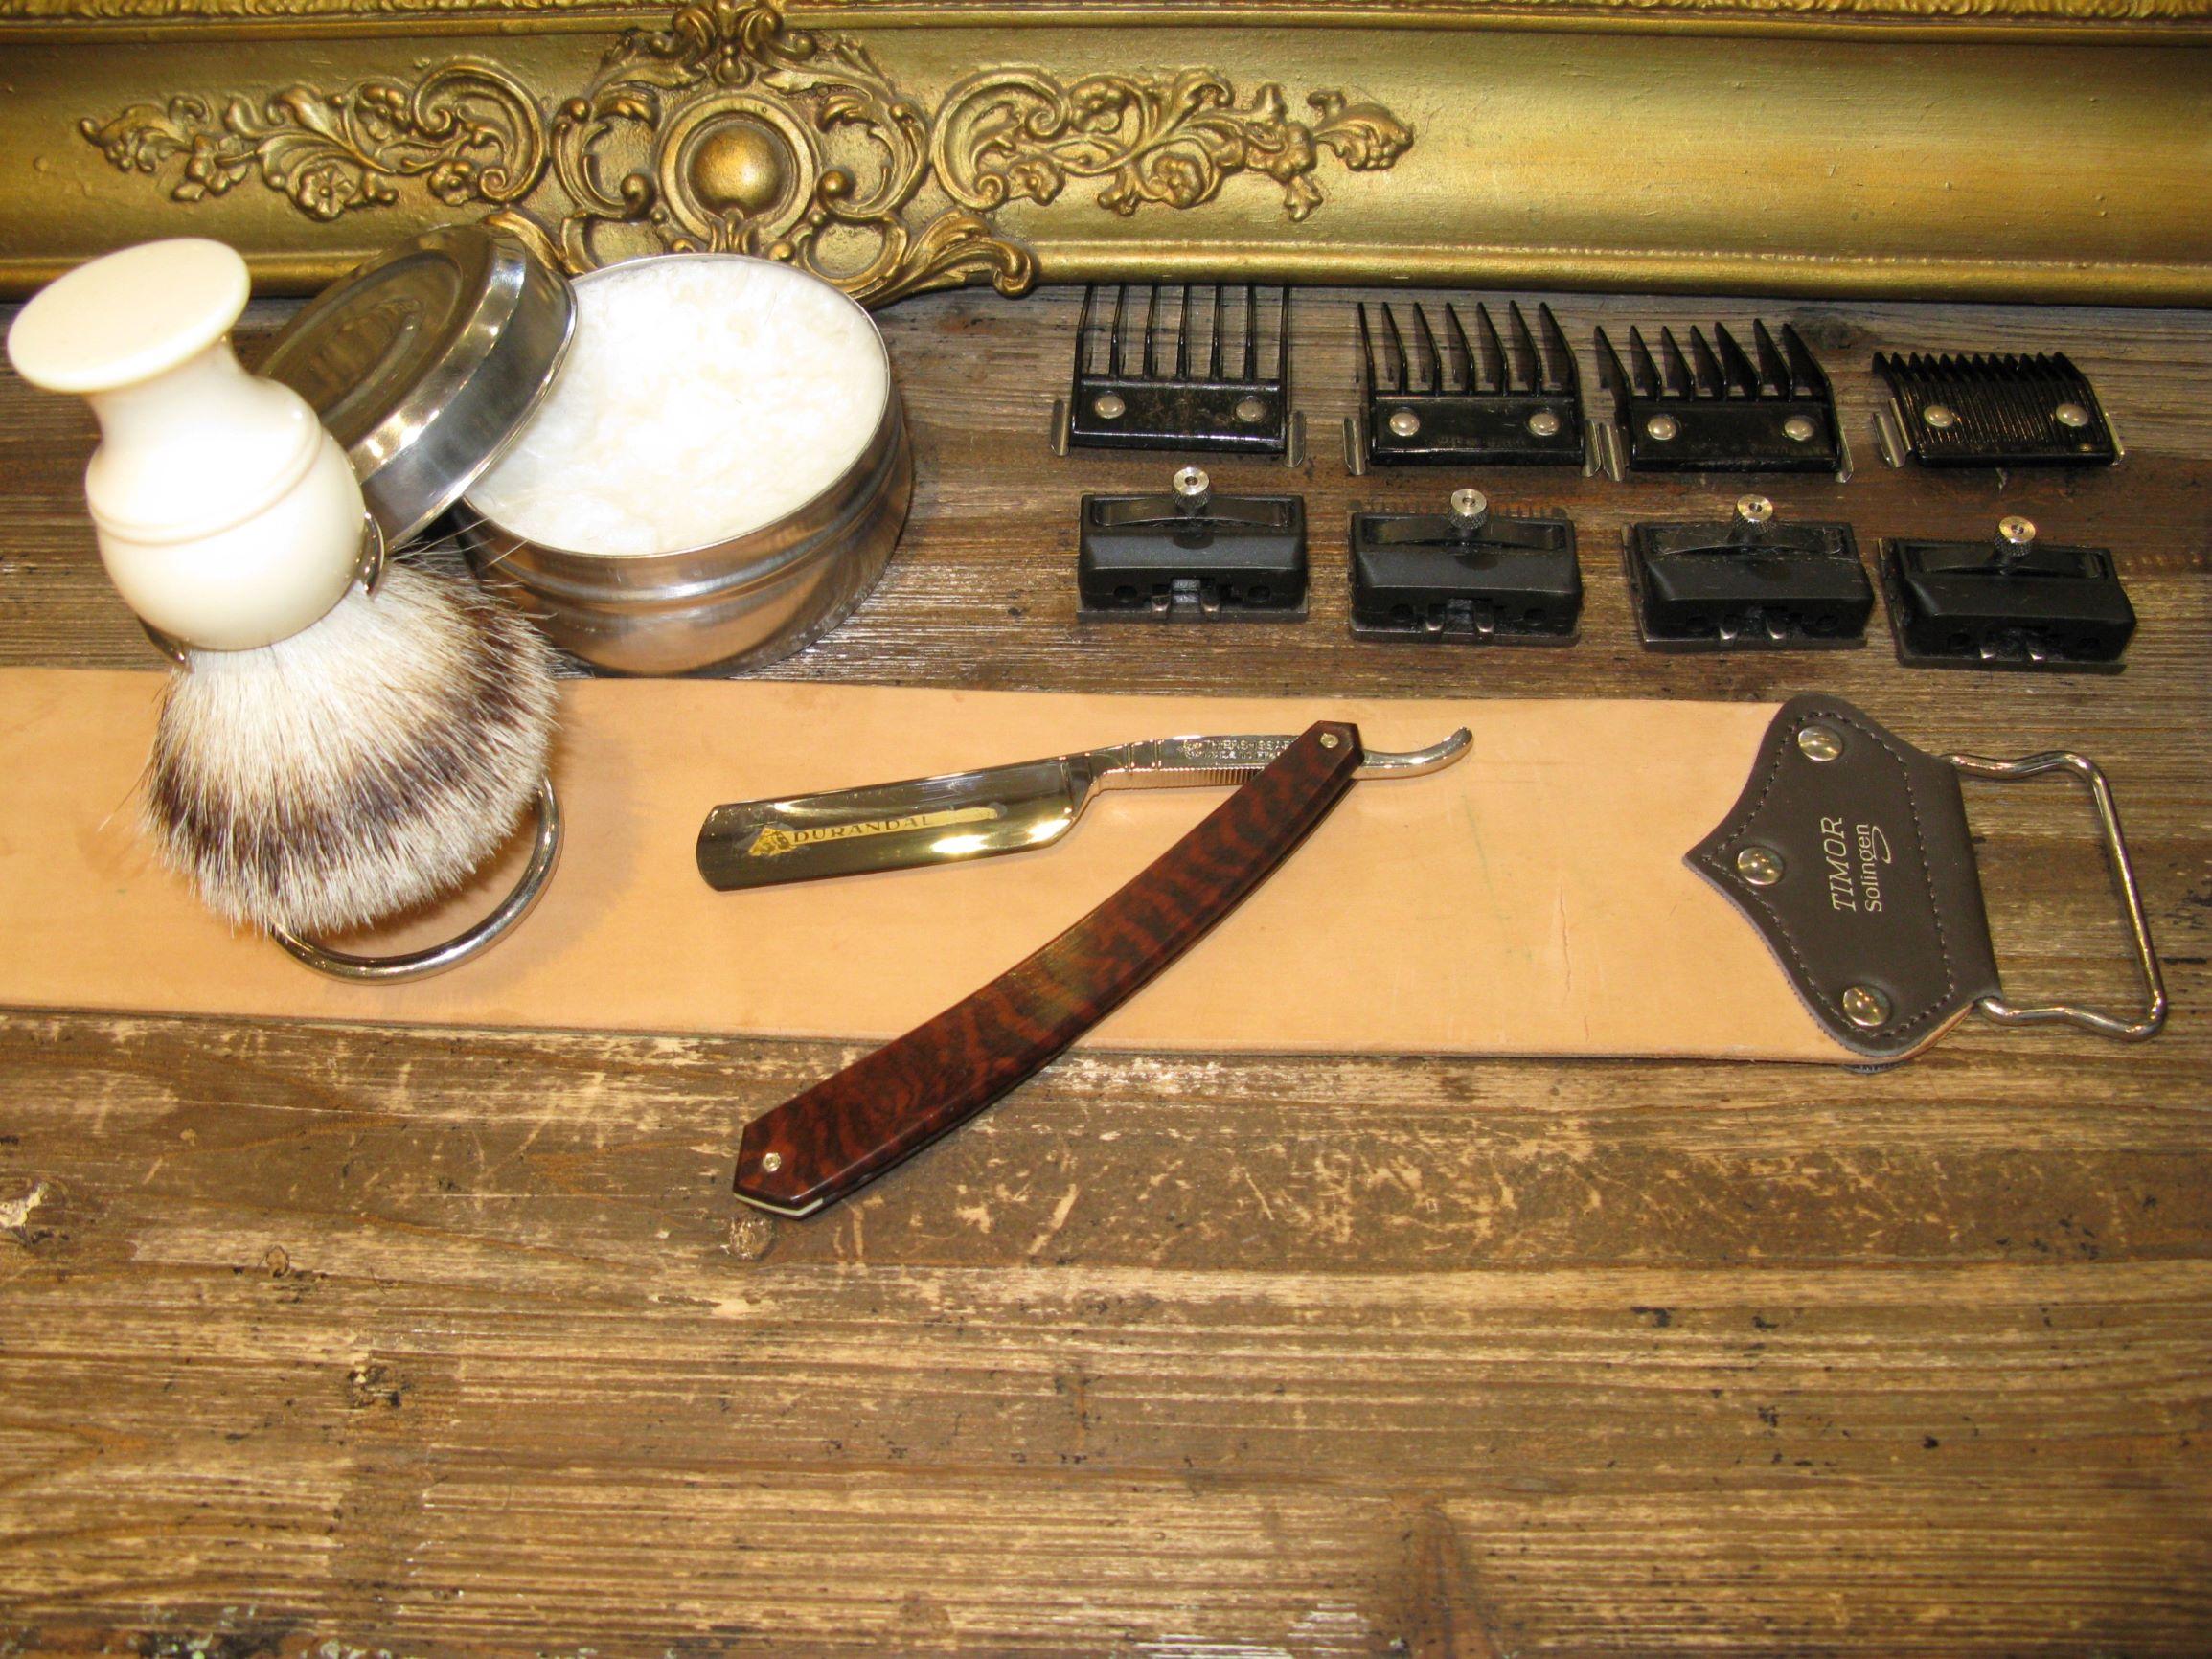 rasoir coupe-chou avec cuir